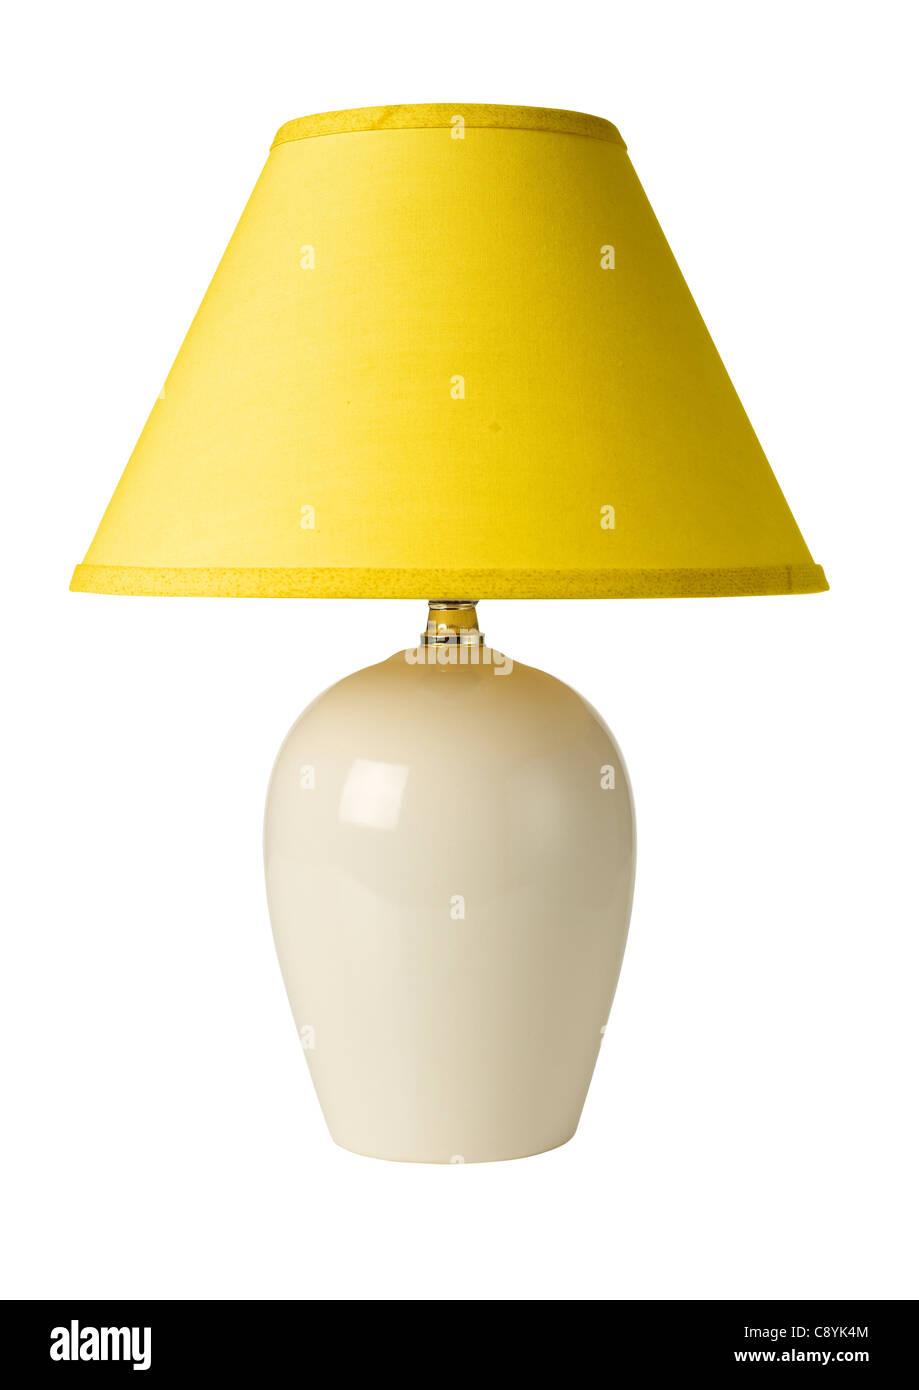 Lámpara de cerámica blanca con matiz amarillo Imagen De Stock